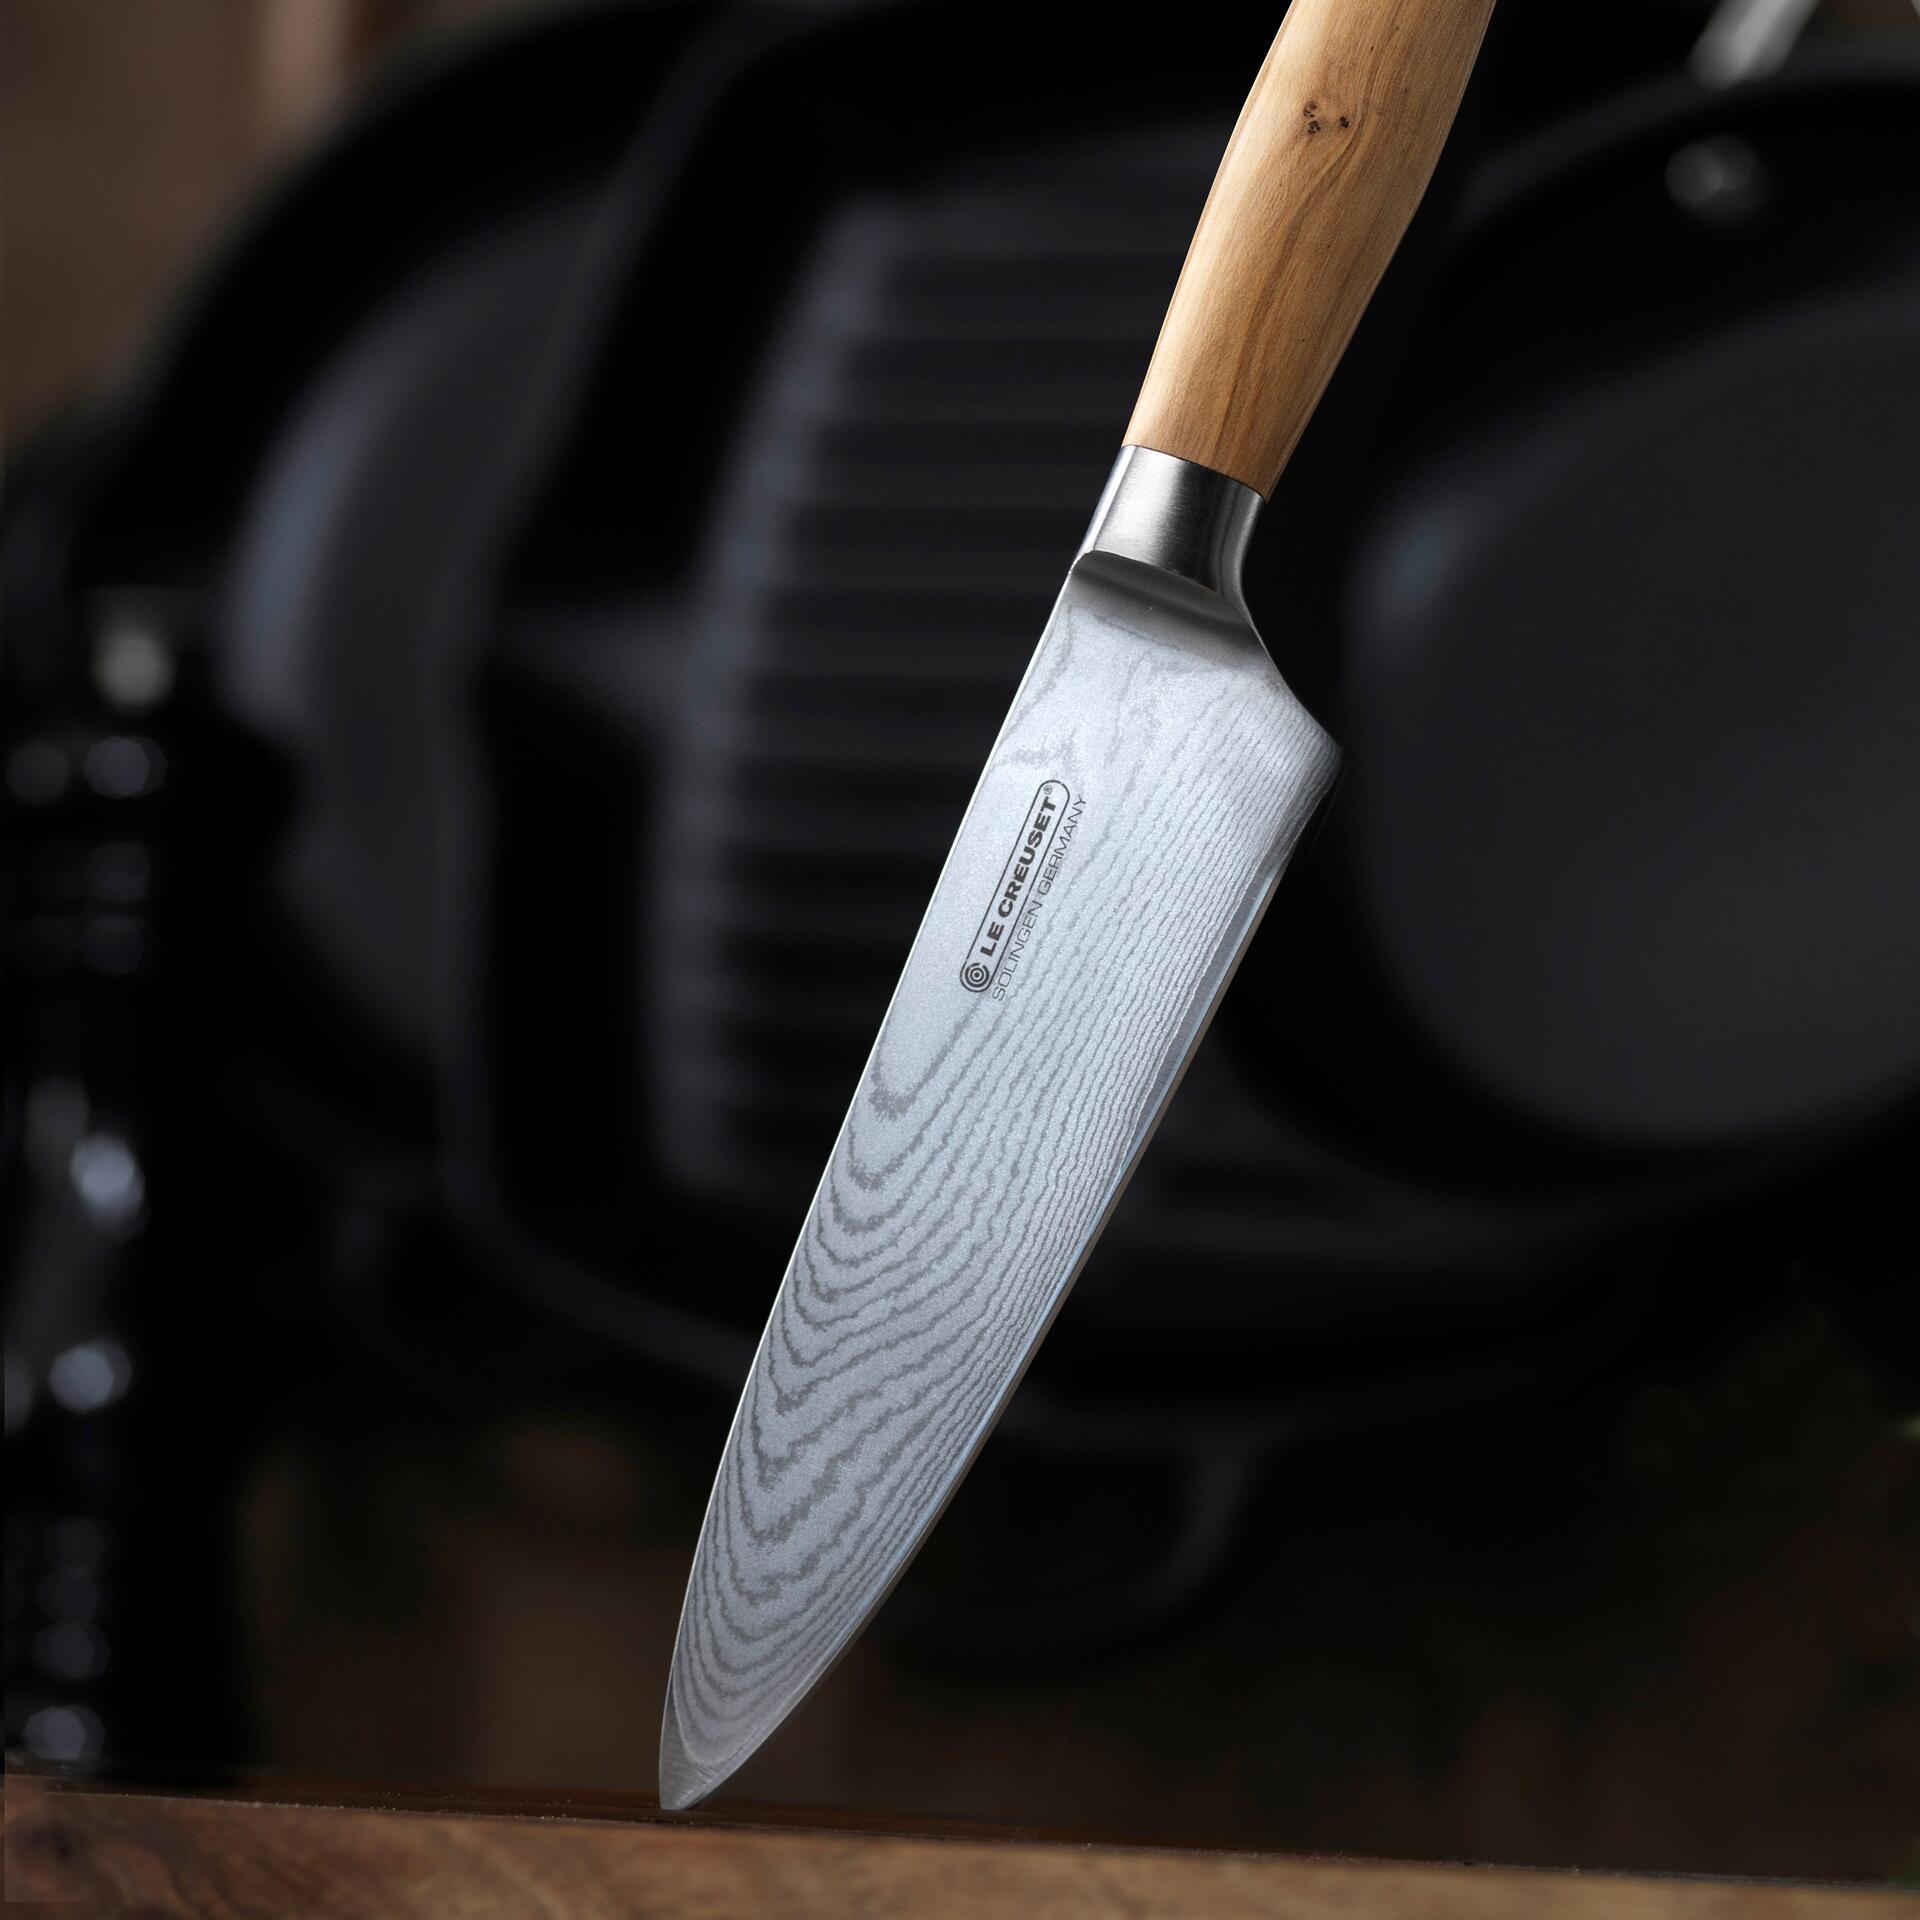 Le Creuset Kochmesser mit Holzgriff Olive 15 cm